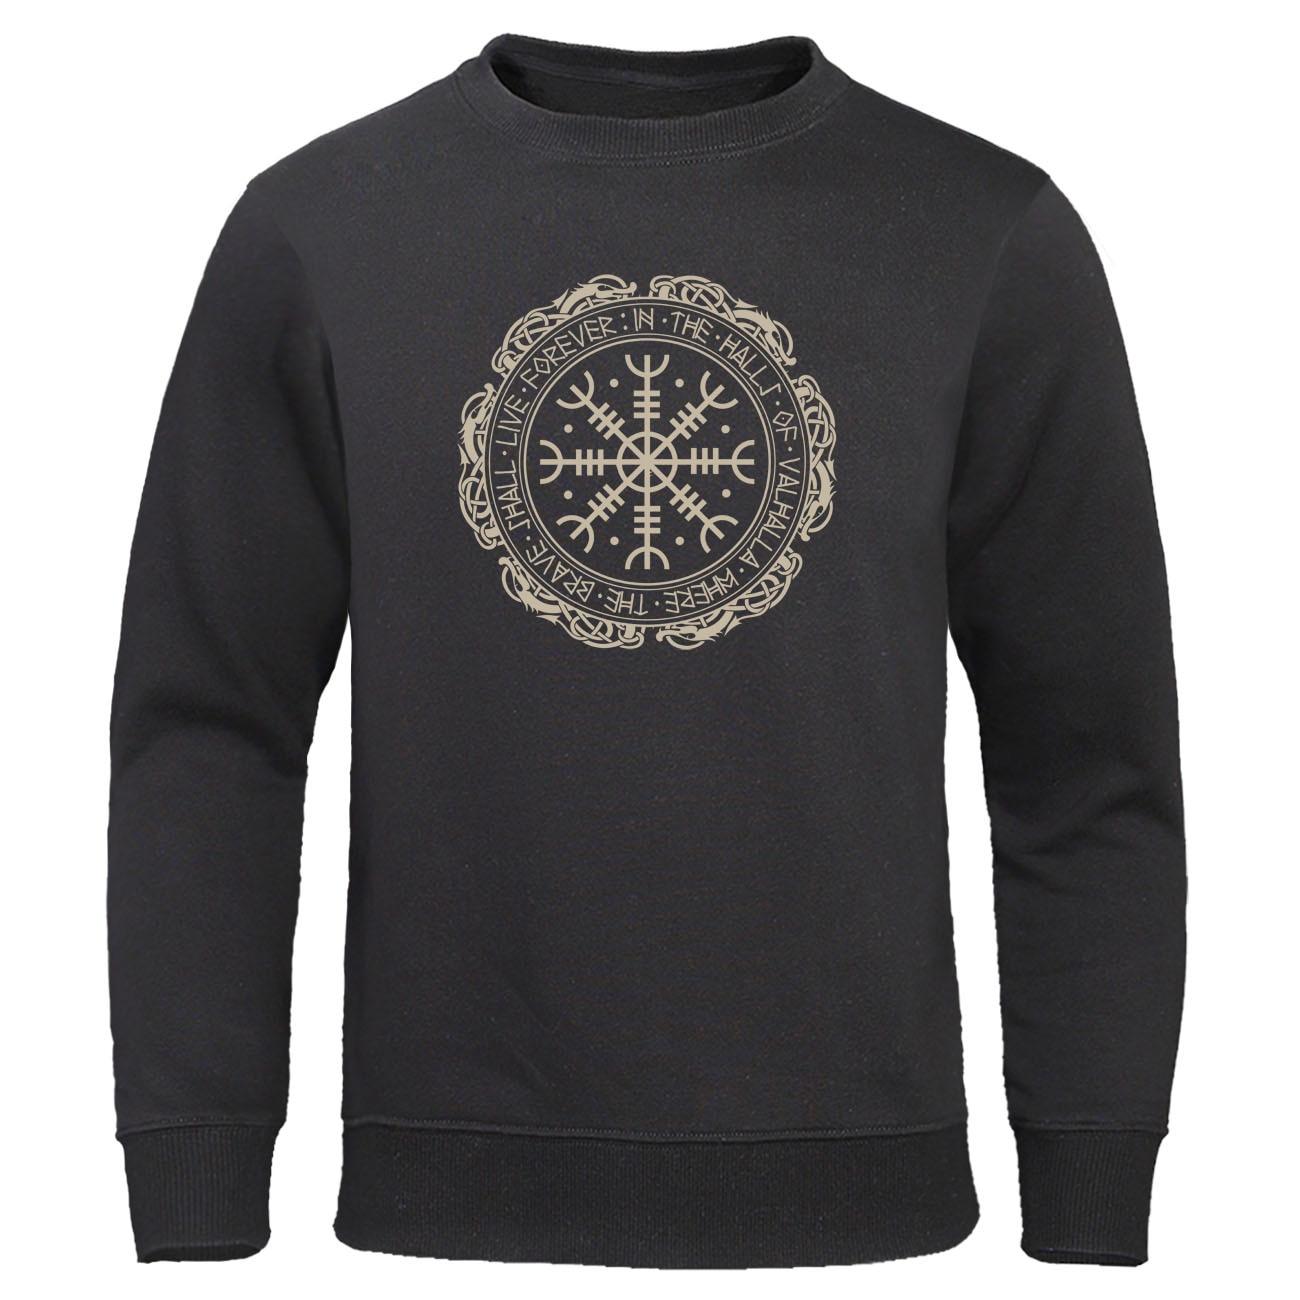 2019 Sweatshirts Retro Classic Viking Valhalla Odin Autumn Winter Sweatshirt Hoodie Men Fashion Print Hoodies Hip Hop Streetwear